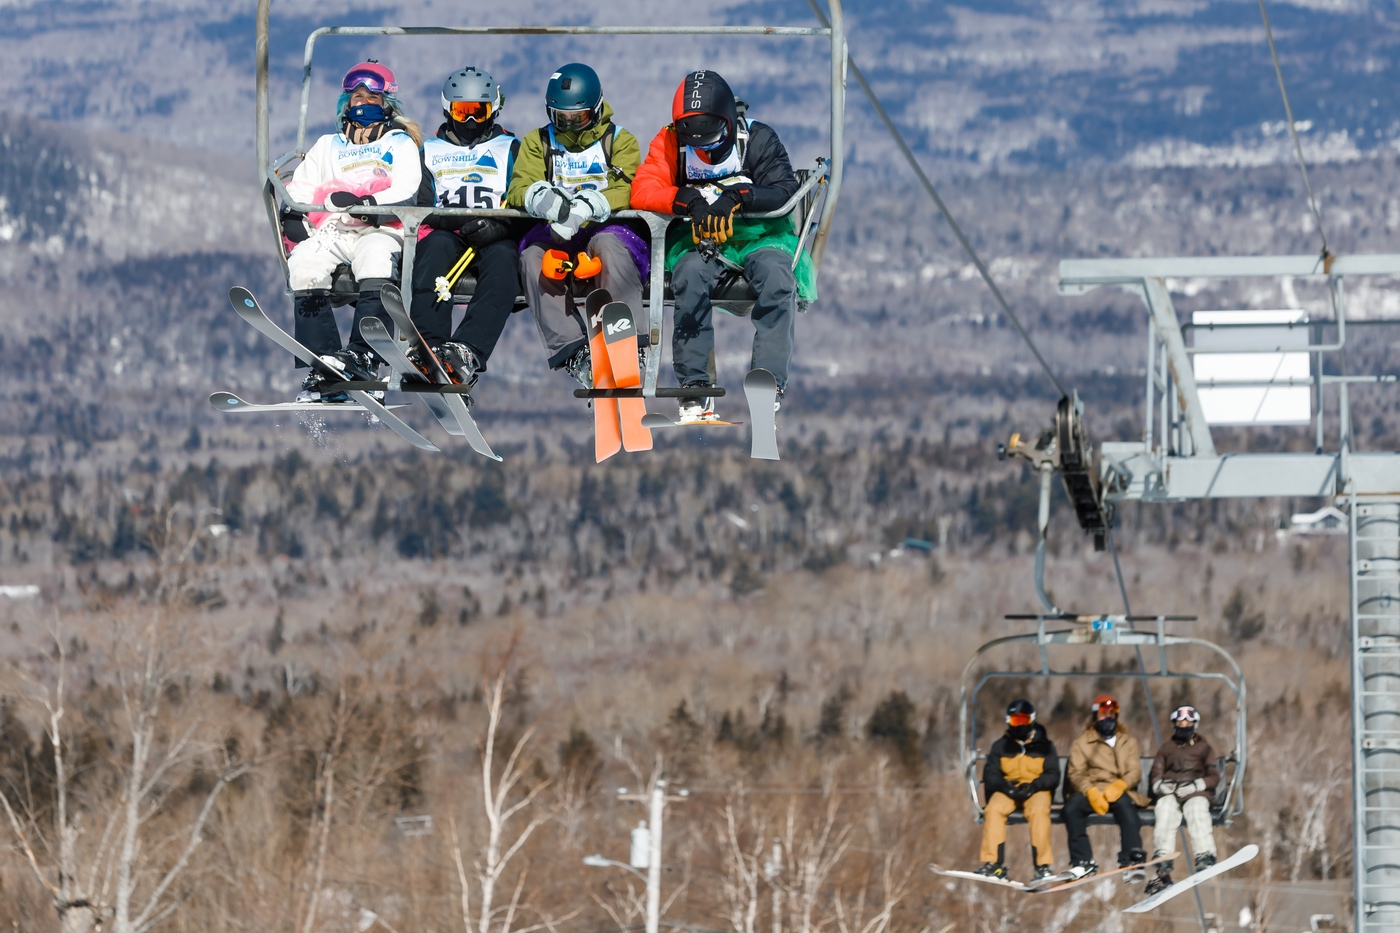 WinterKids Downhill 24 2021 SDP 3231